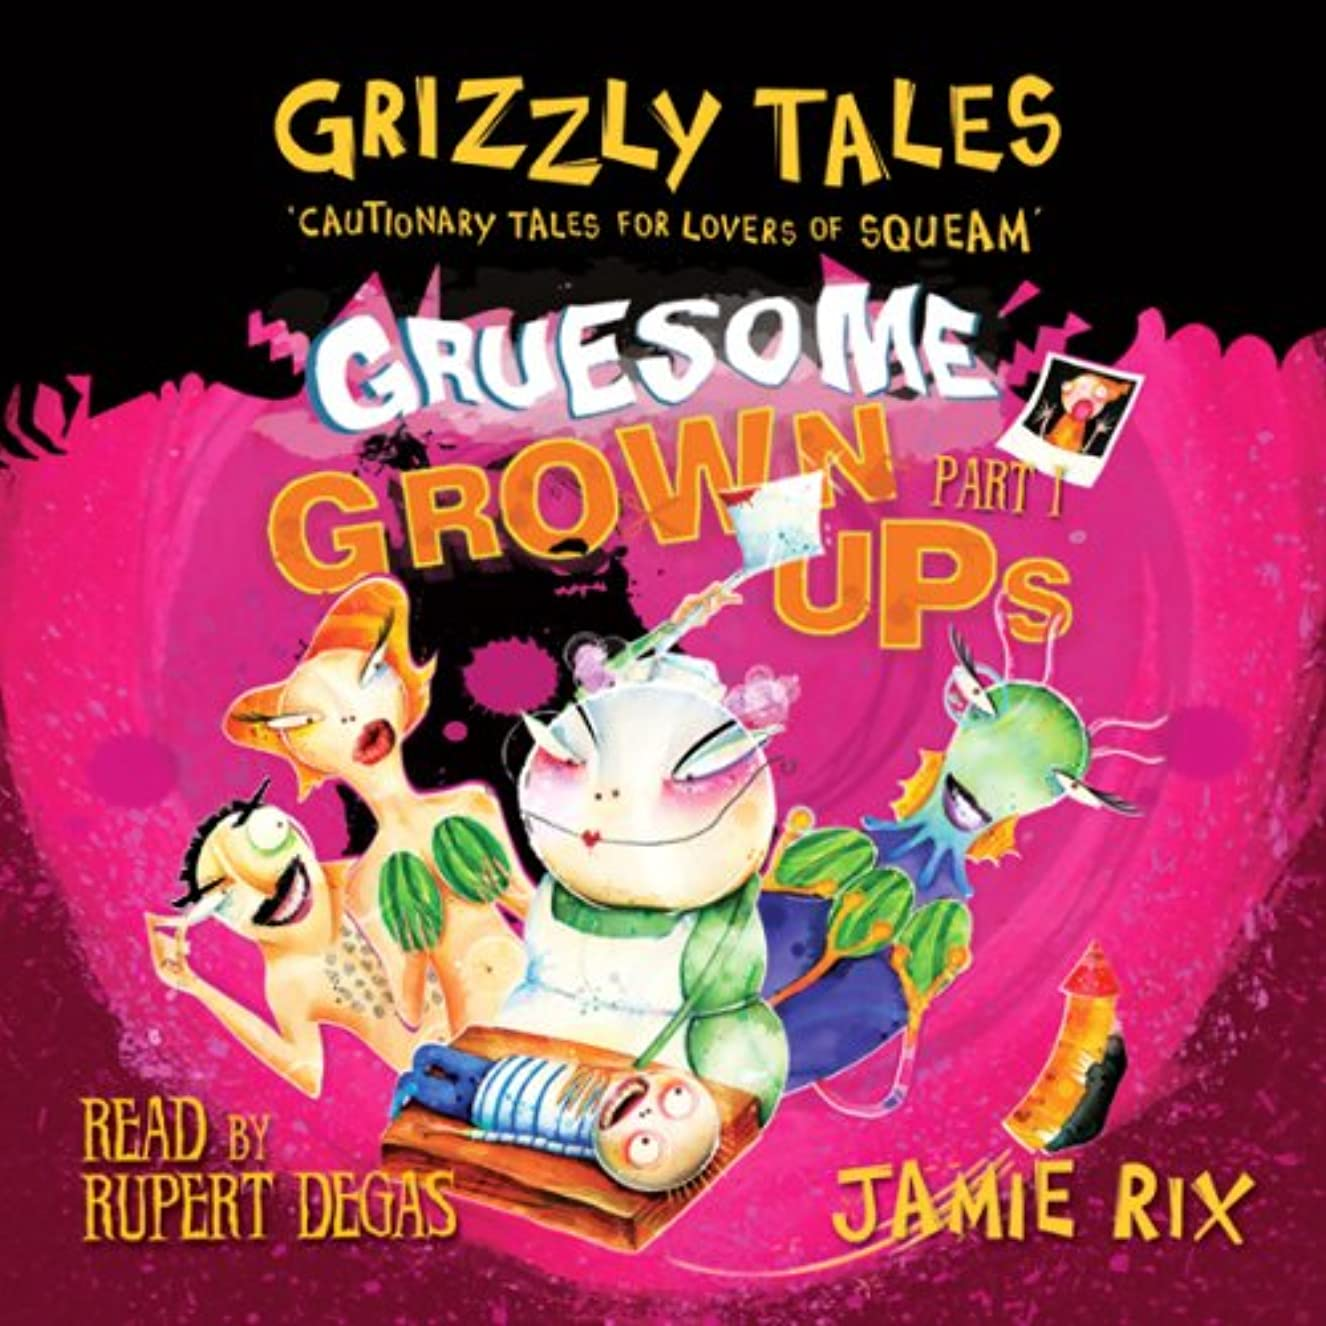 自治絶滅誤解Grizzly Tales: Gruesome Grown-Ups 2.1